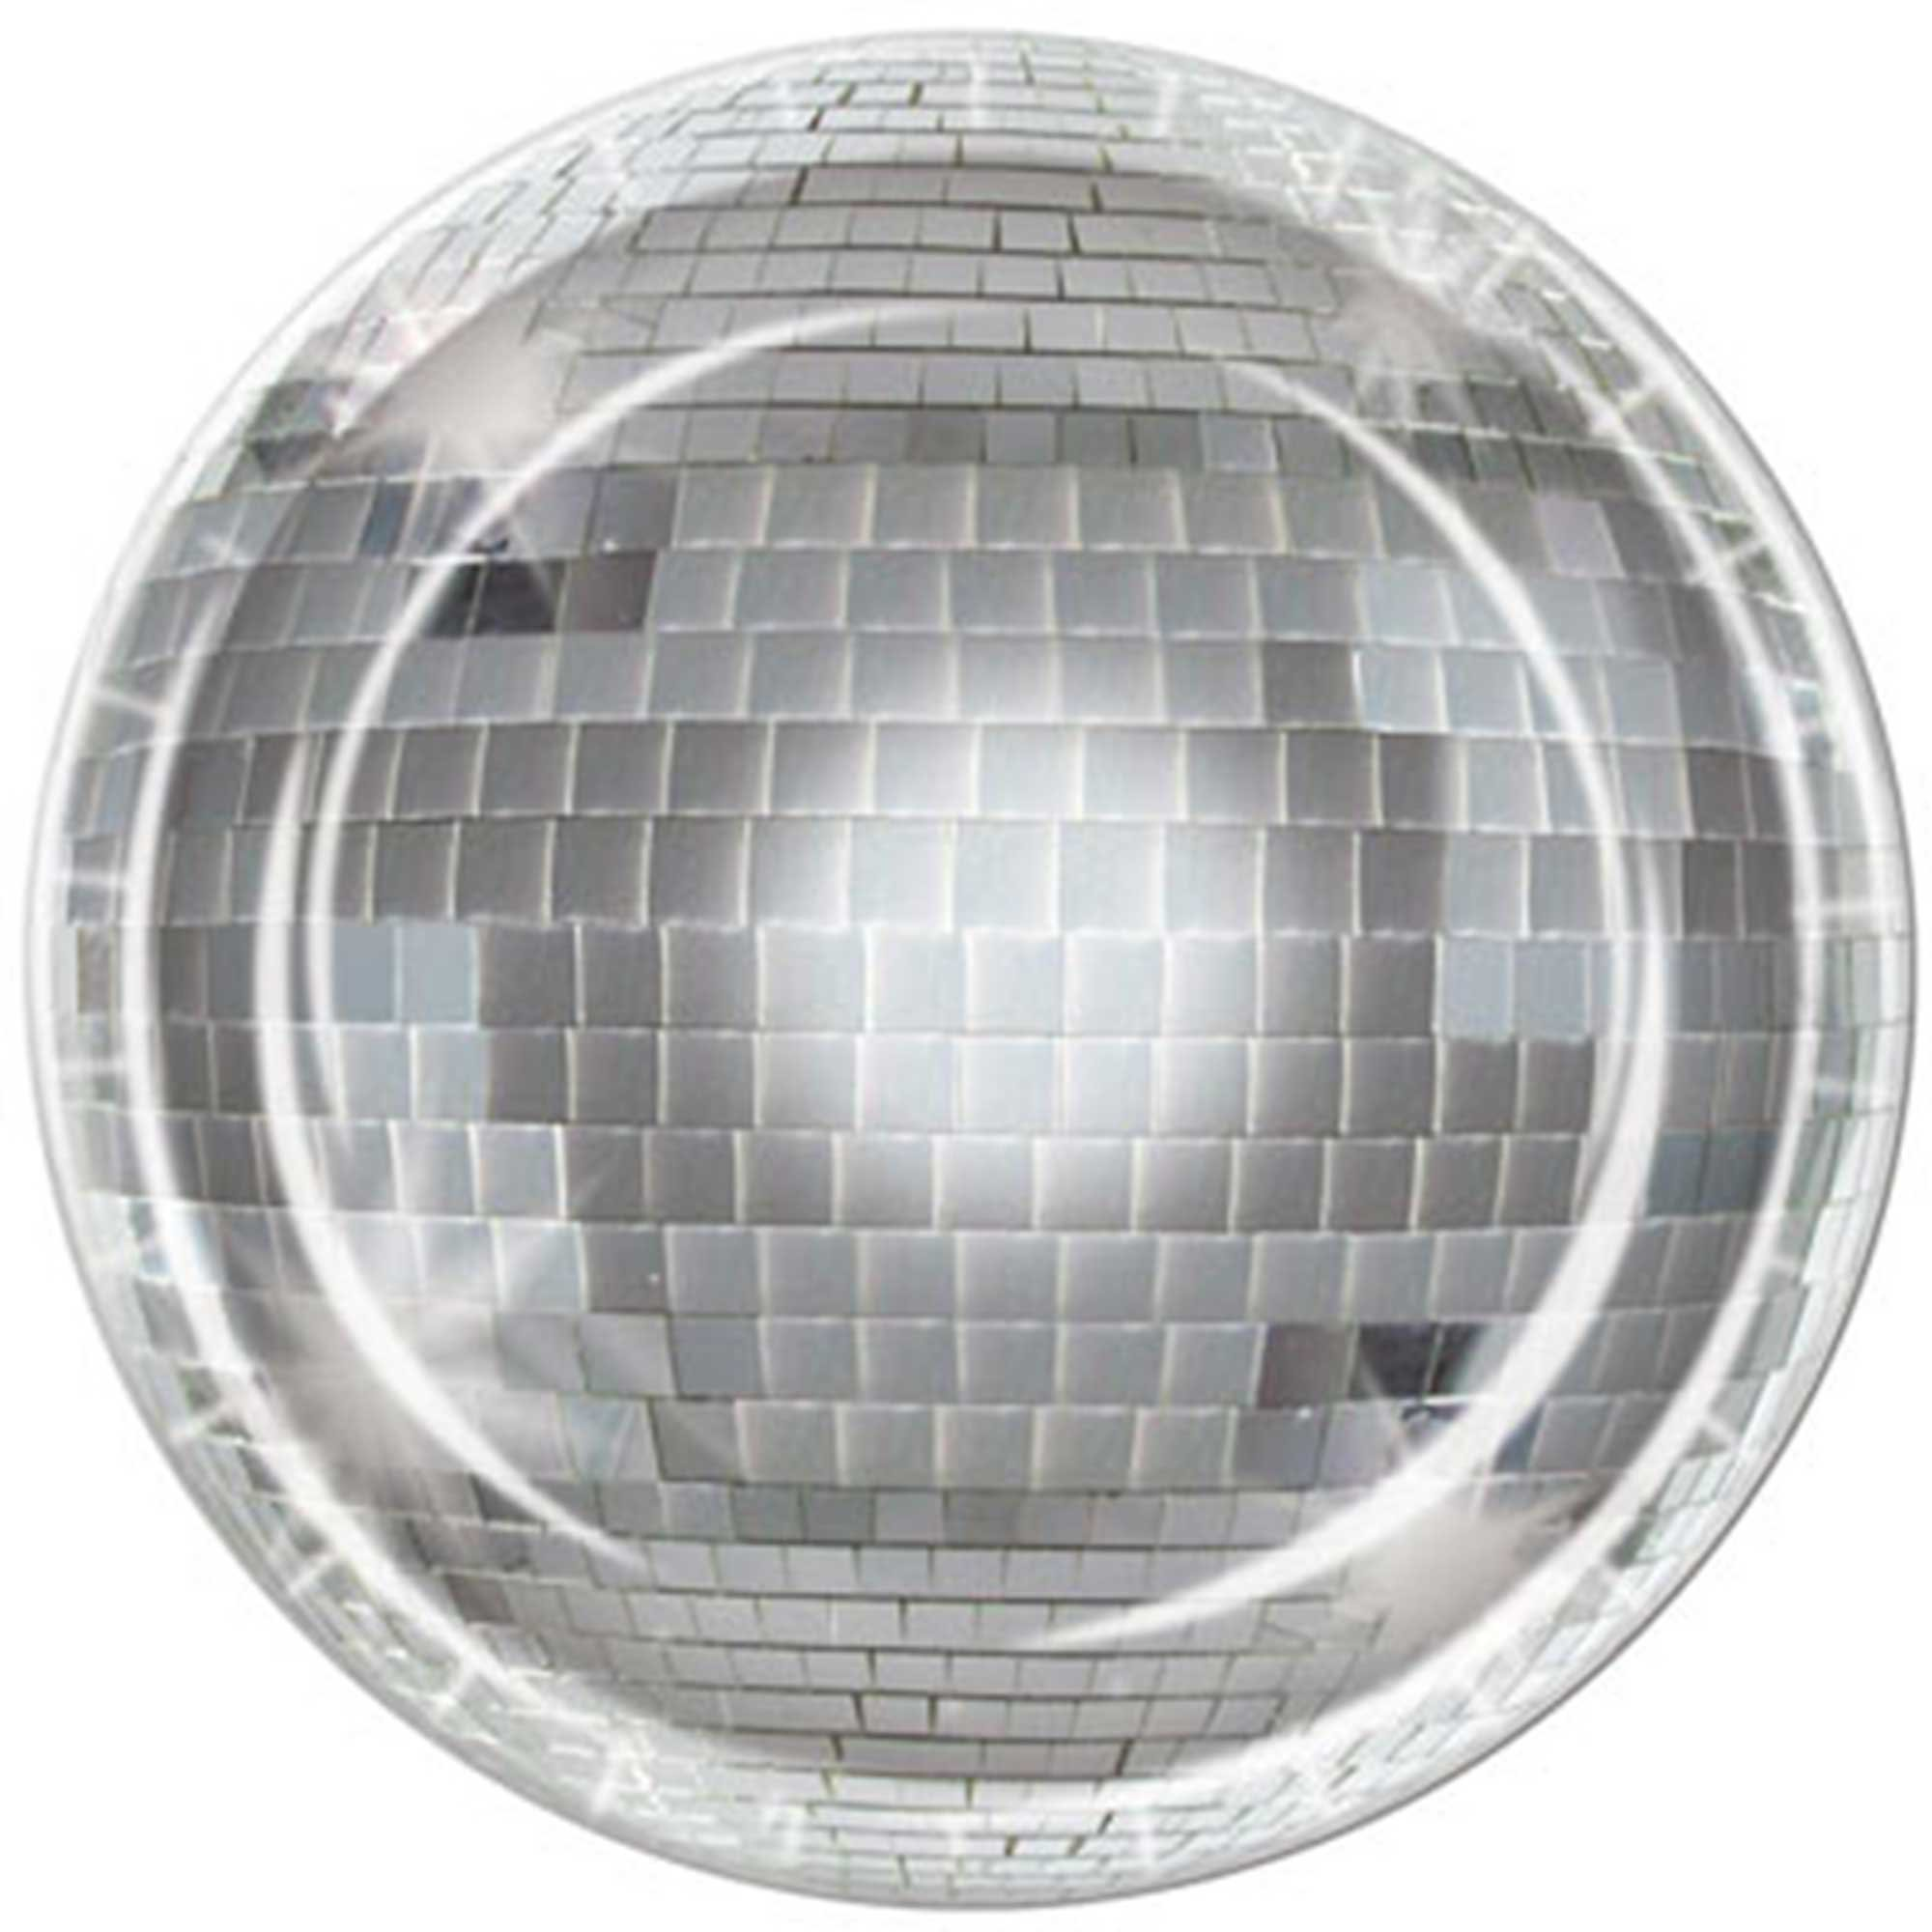 Disco Ball Dinner Plates